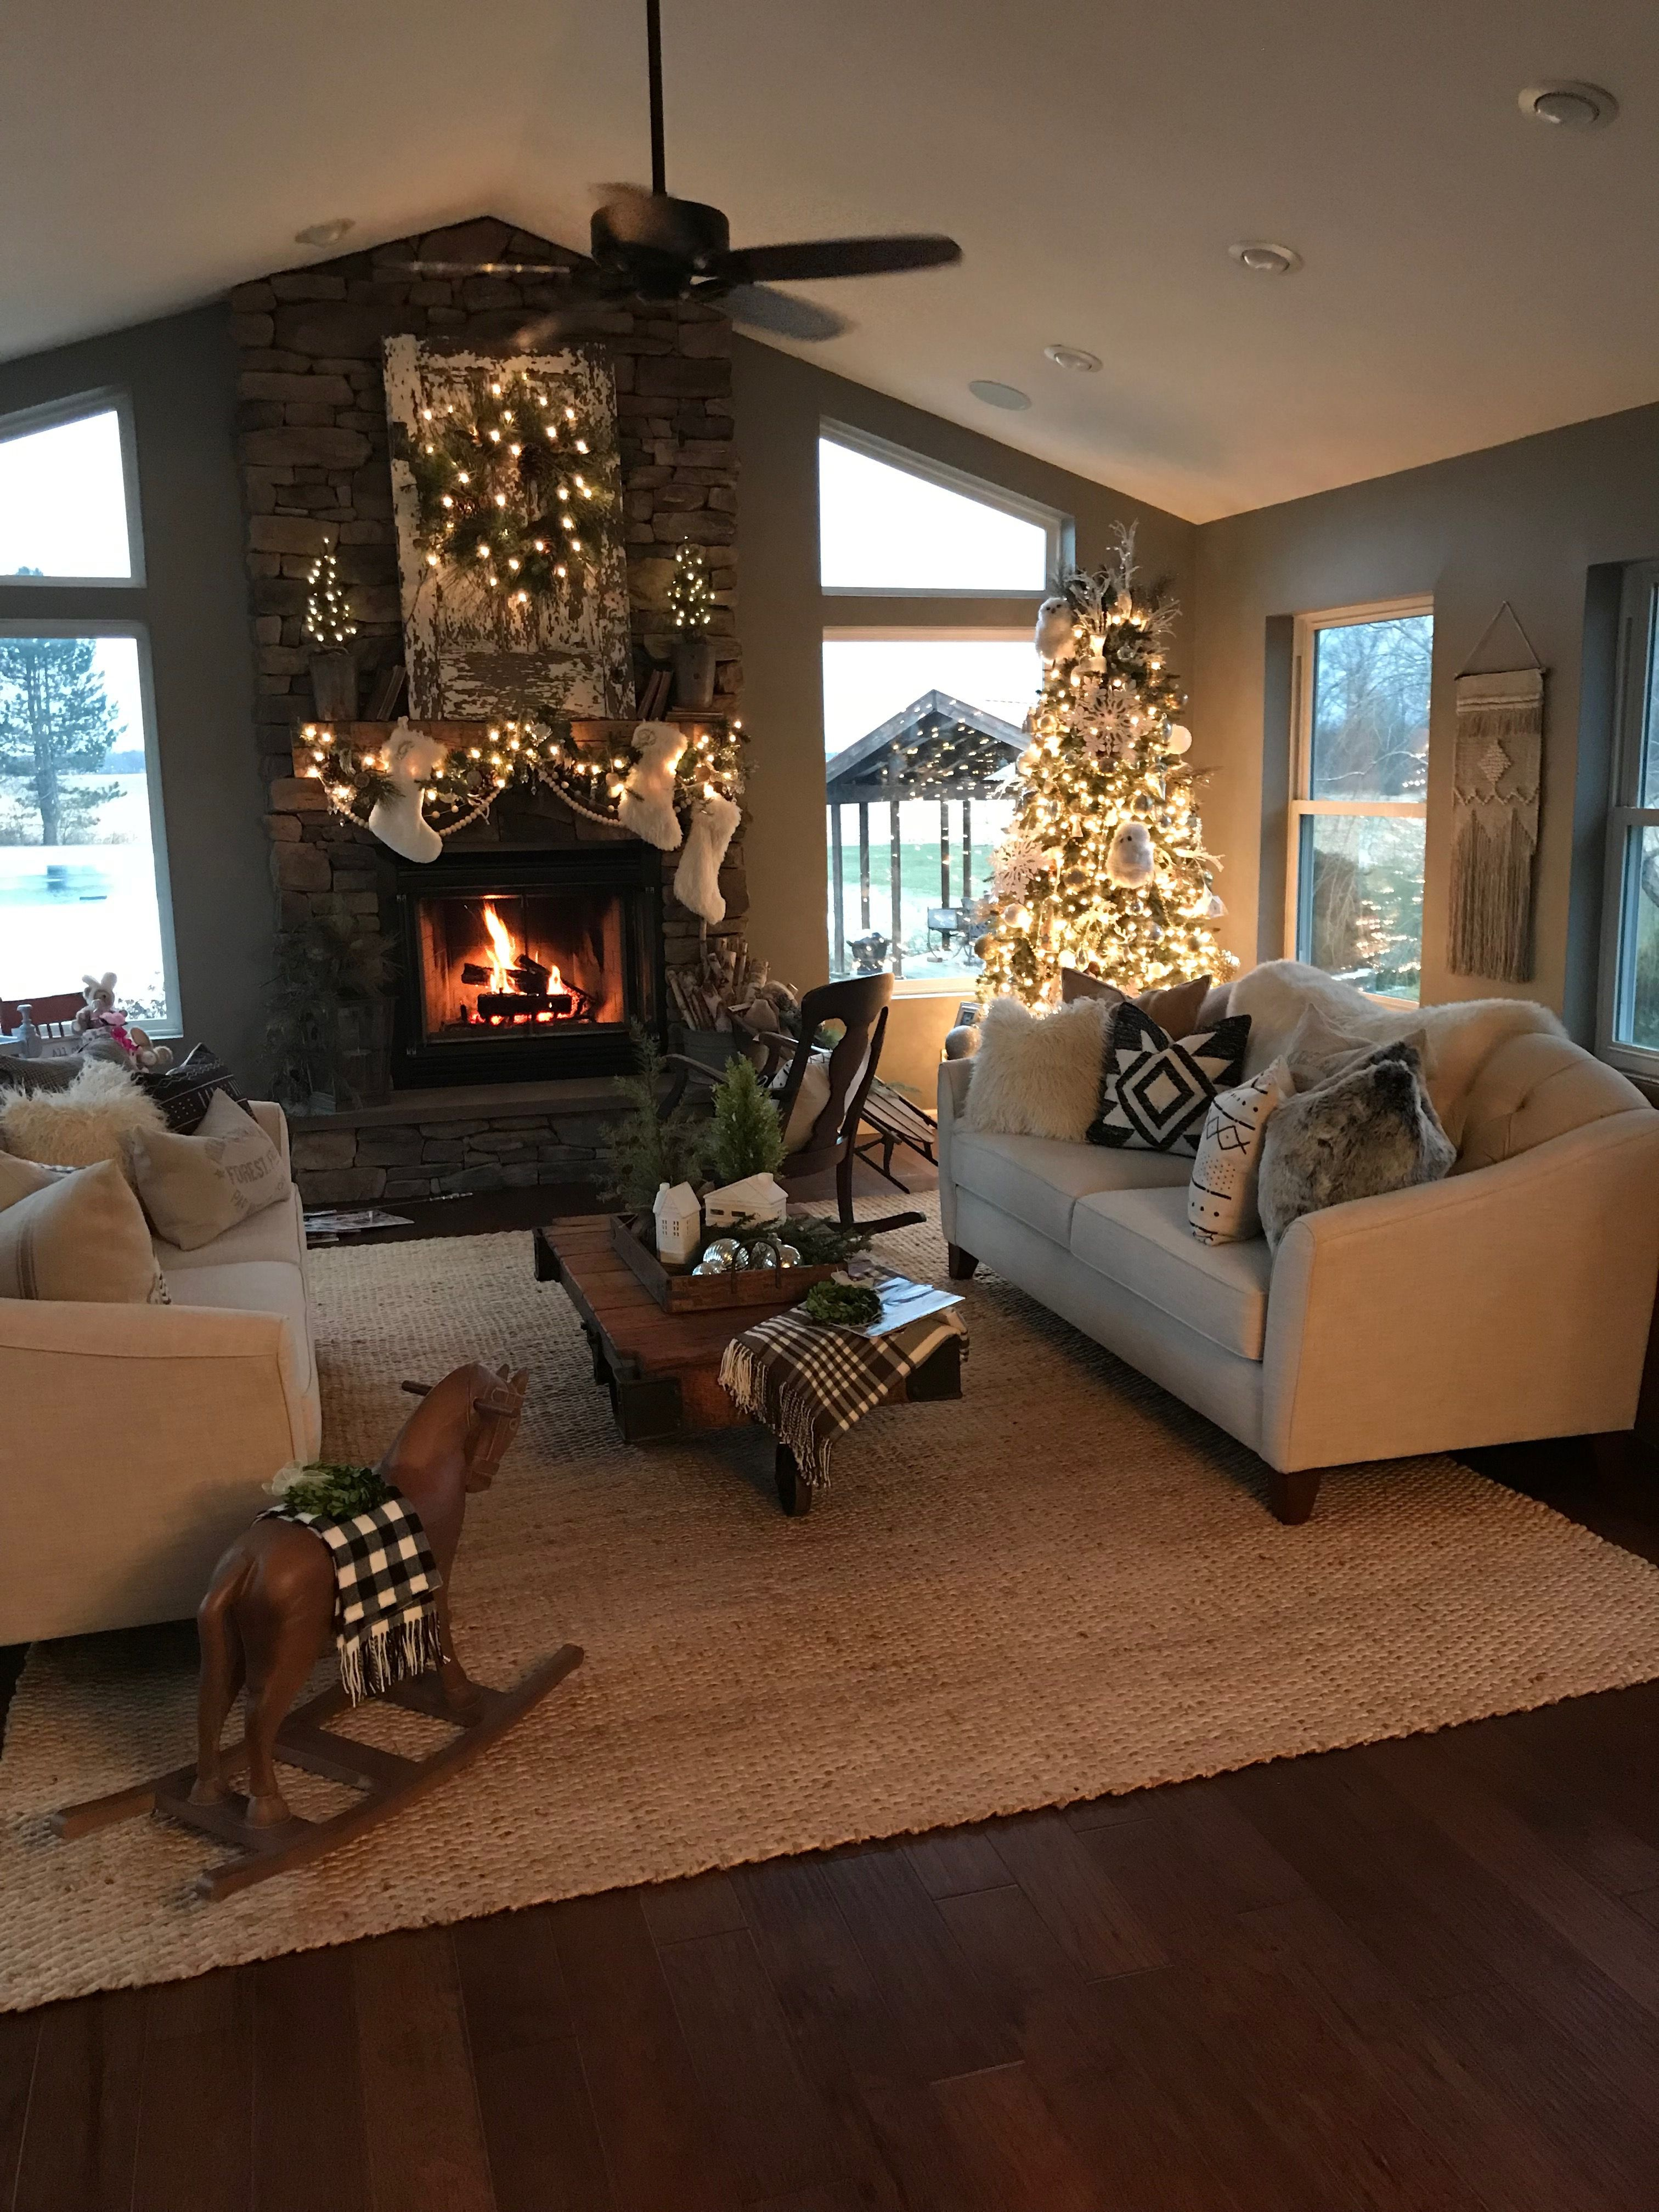 Home Additions Sunroom Decorating Four Seasons Room: Family Room Addition, Four Seasons Room, Fireplace